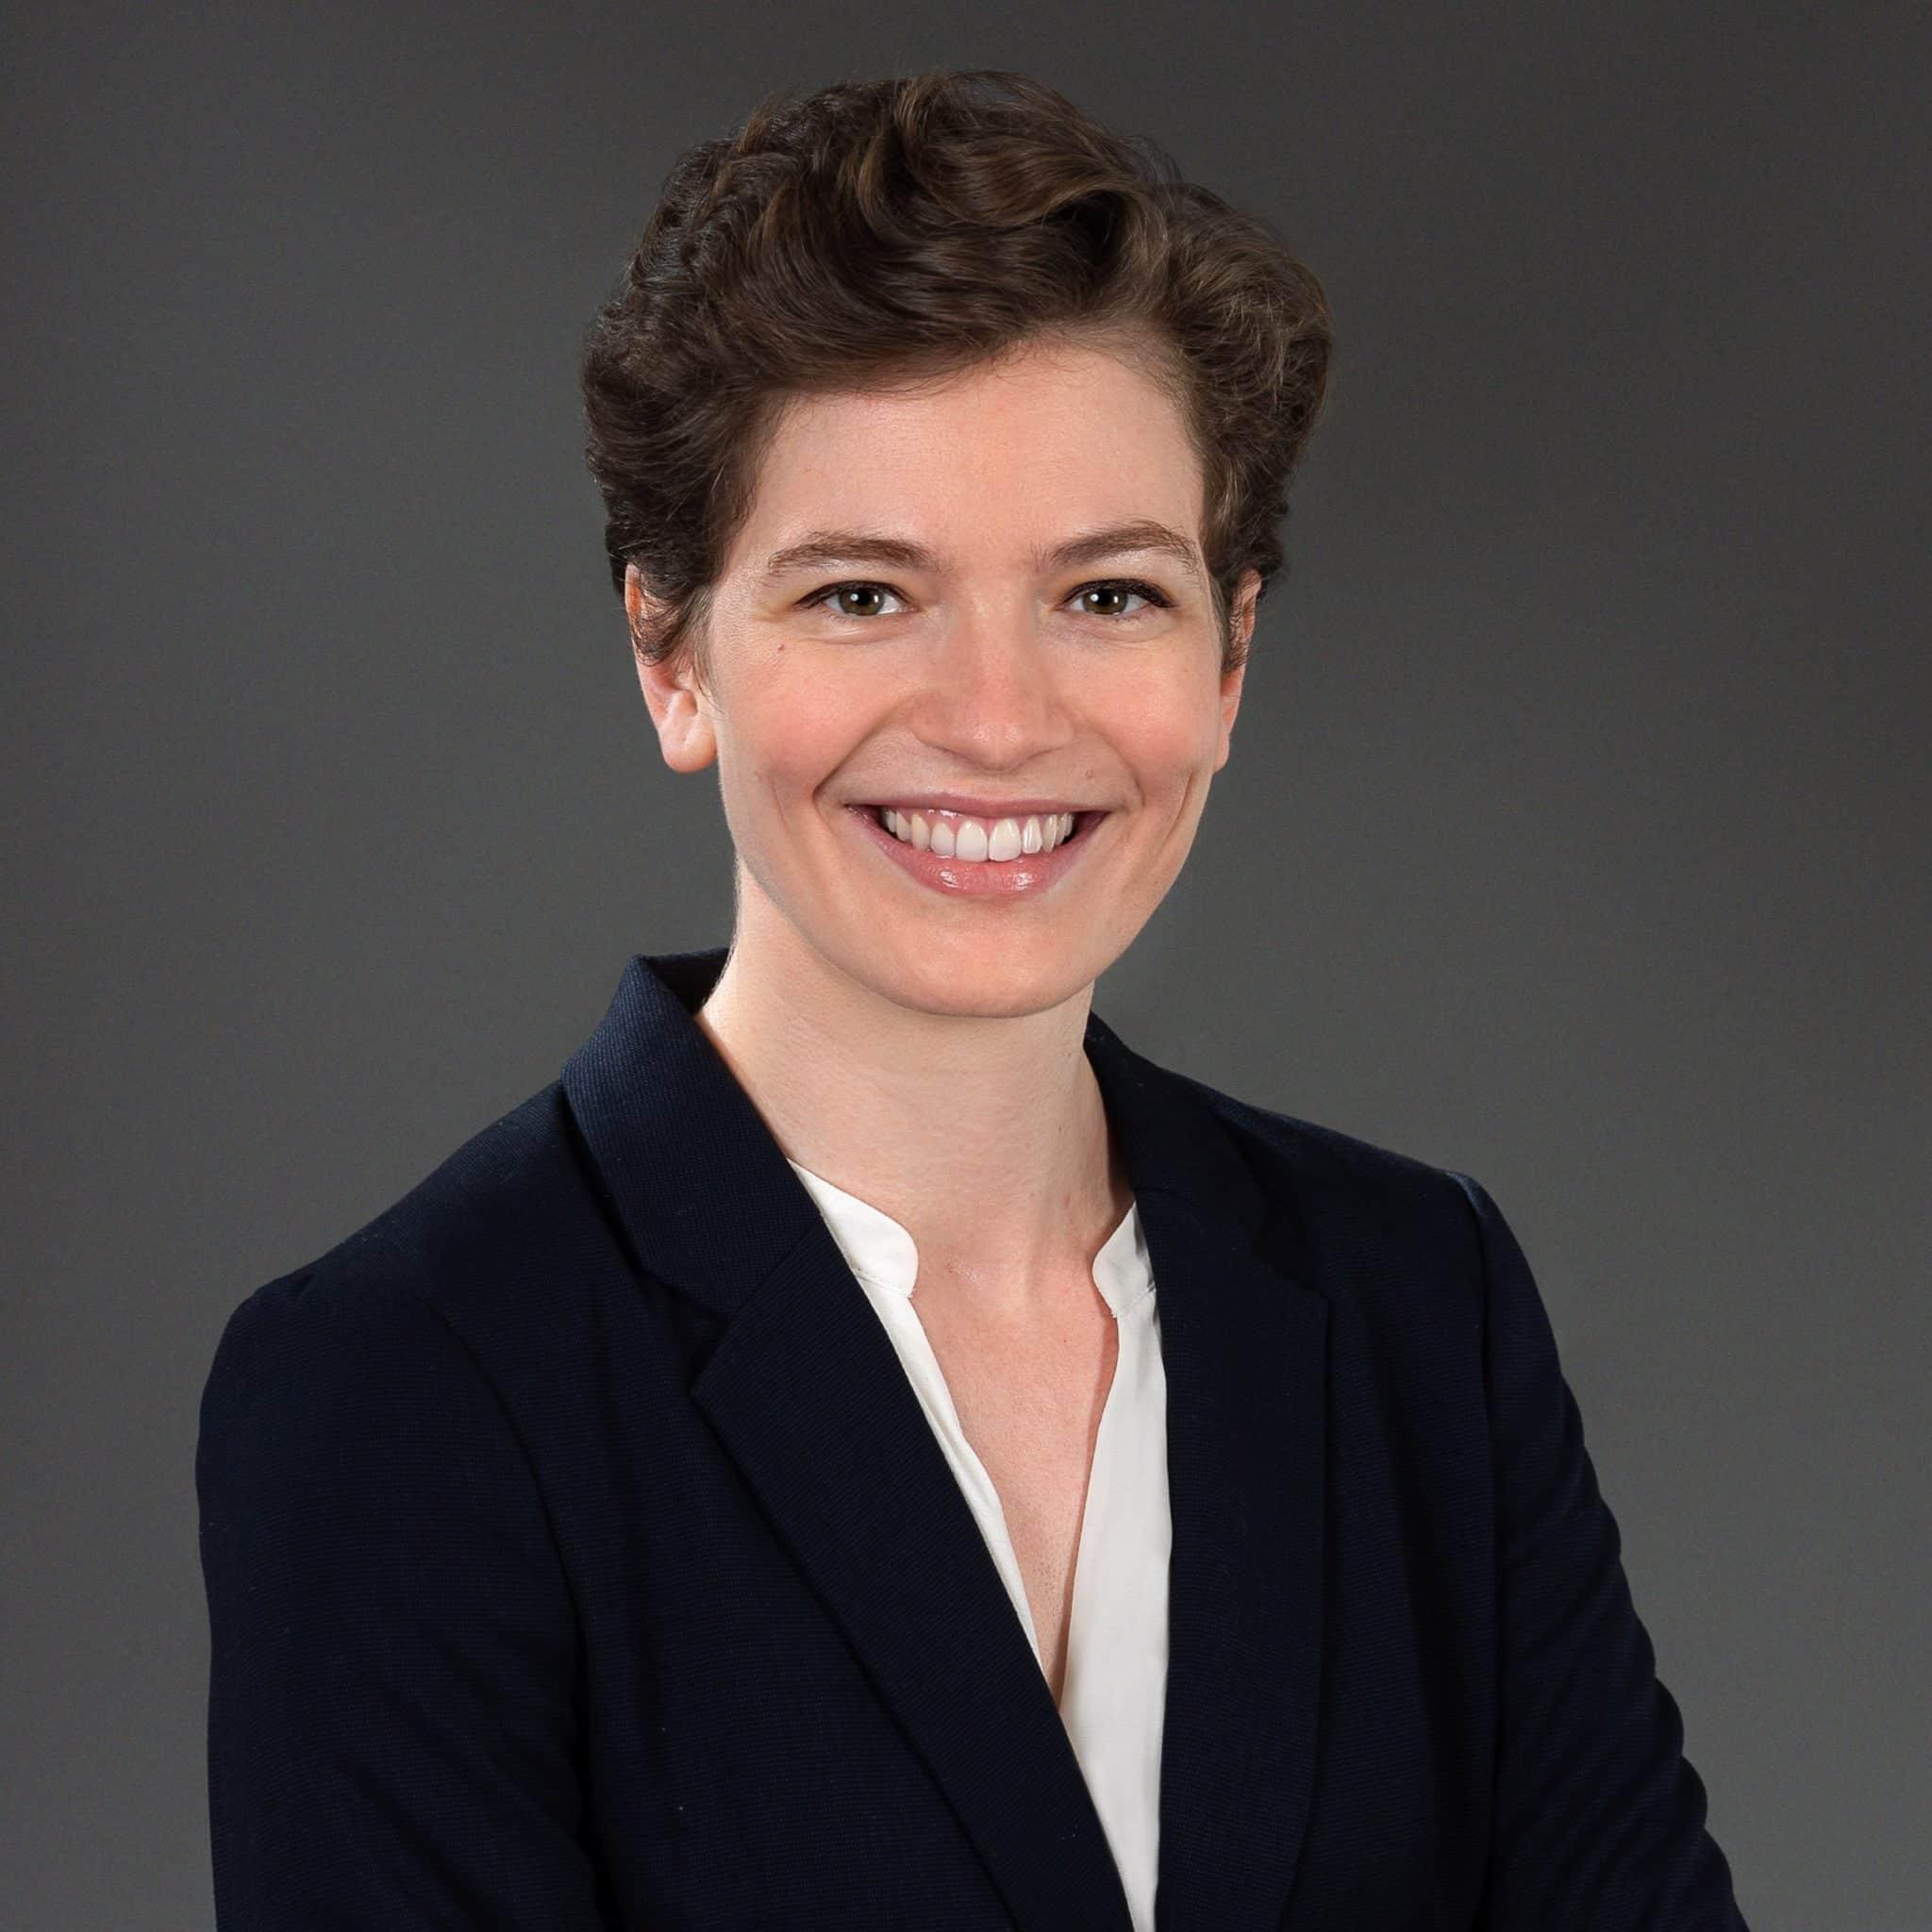 M. Sc. Psych. Katrin Bernath - Psychologische Psychotherapeutin in Berlin